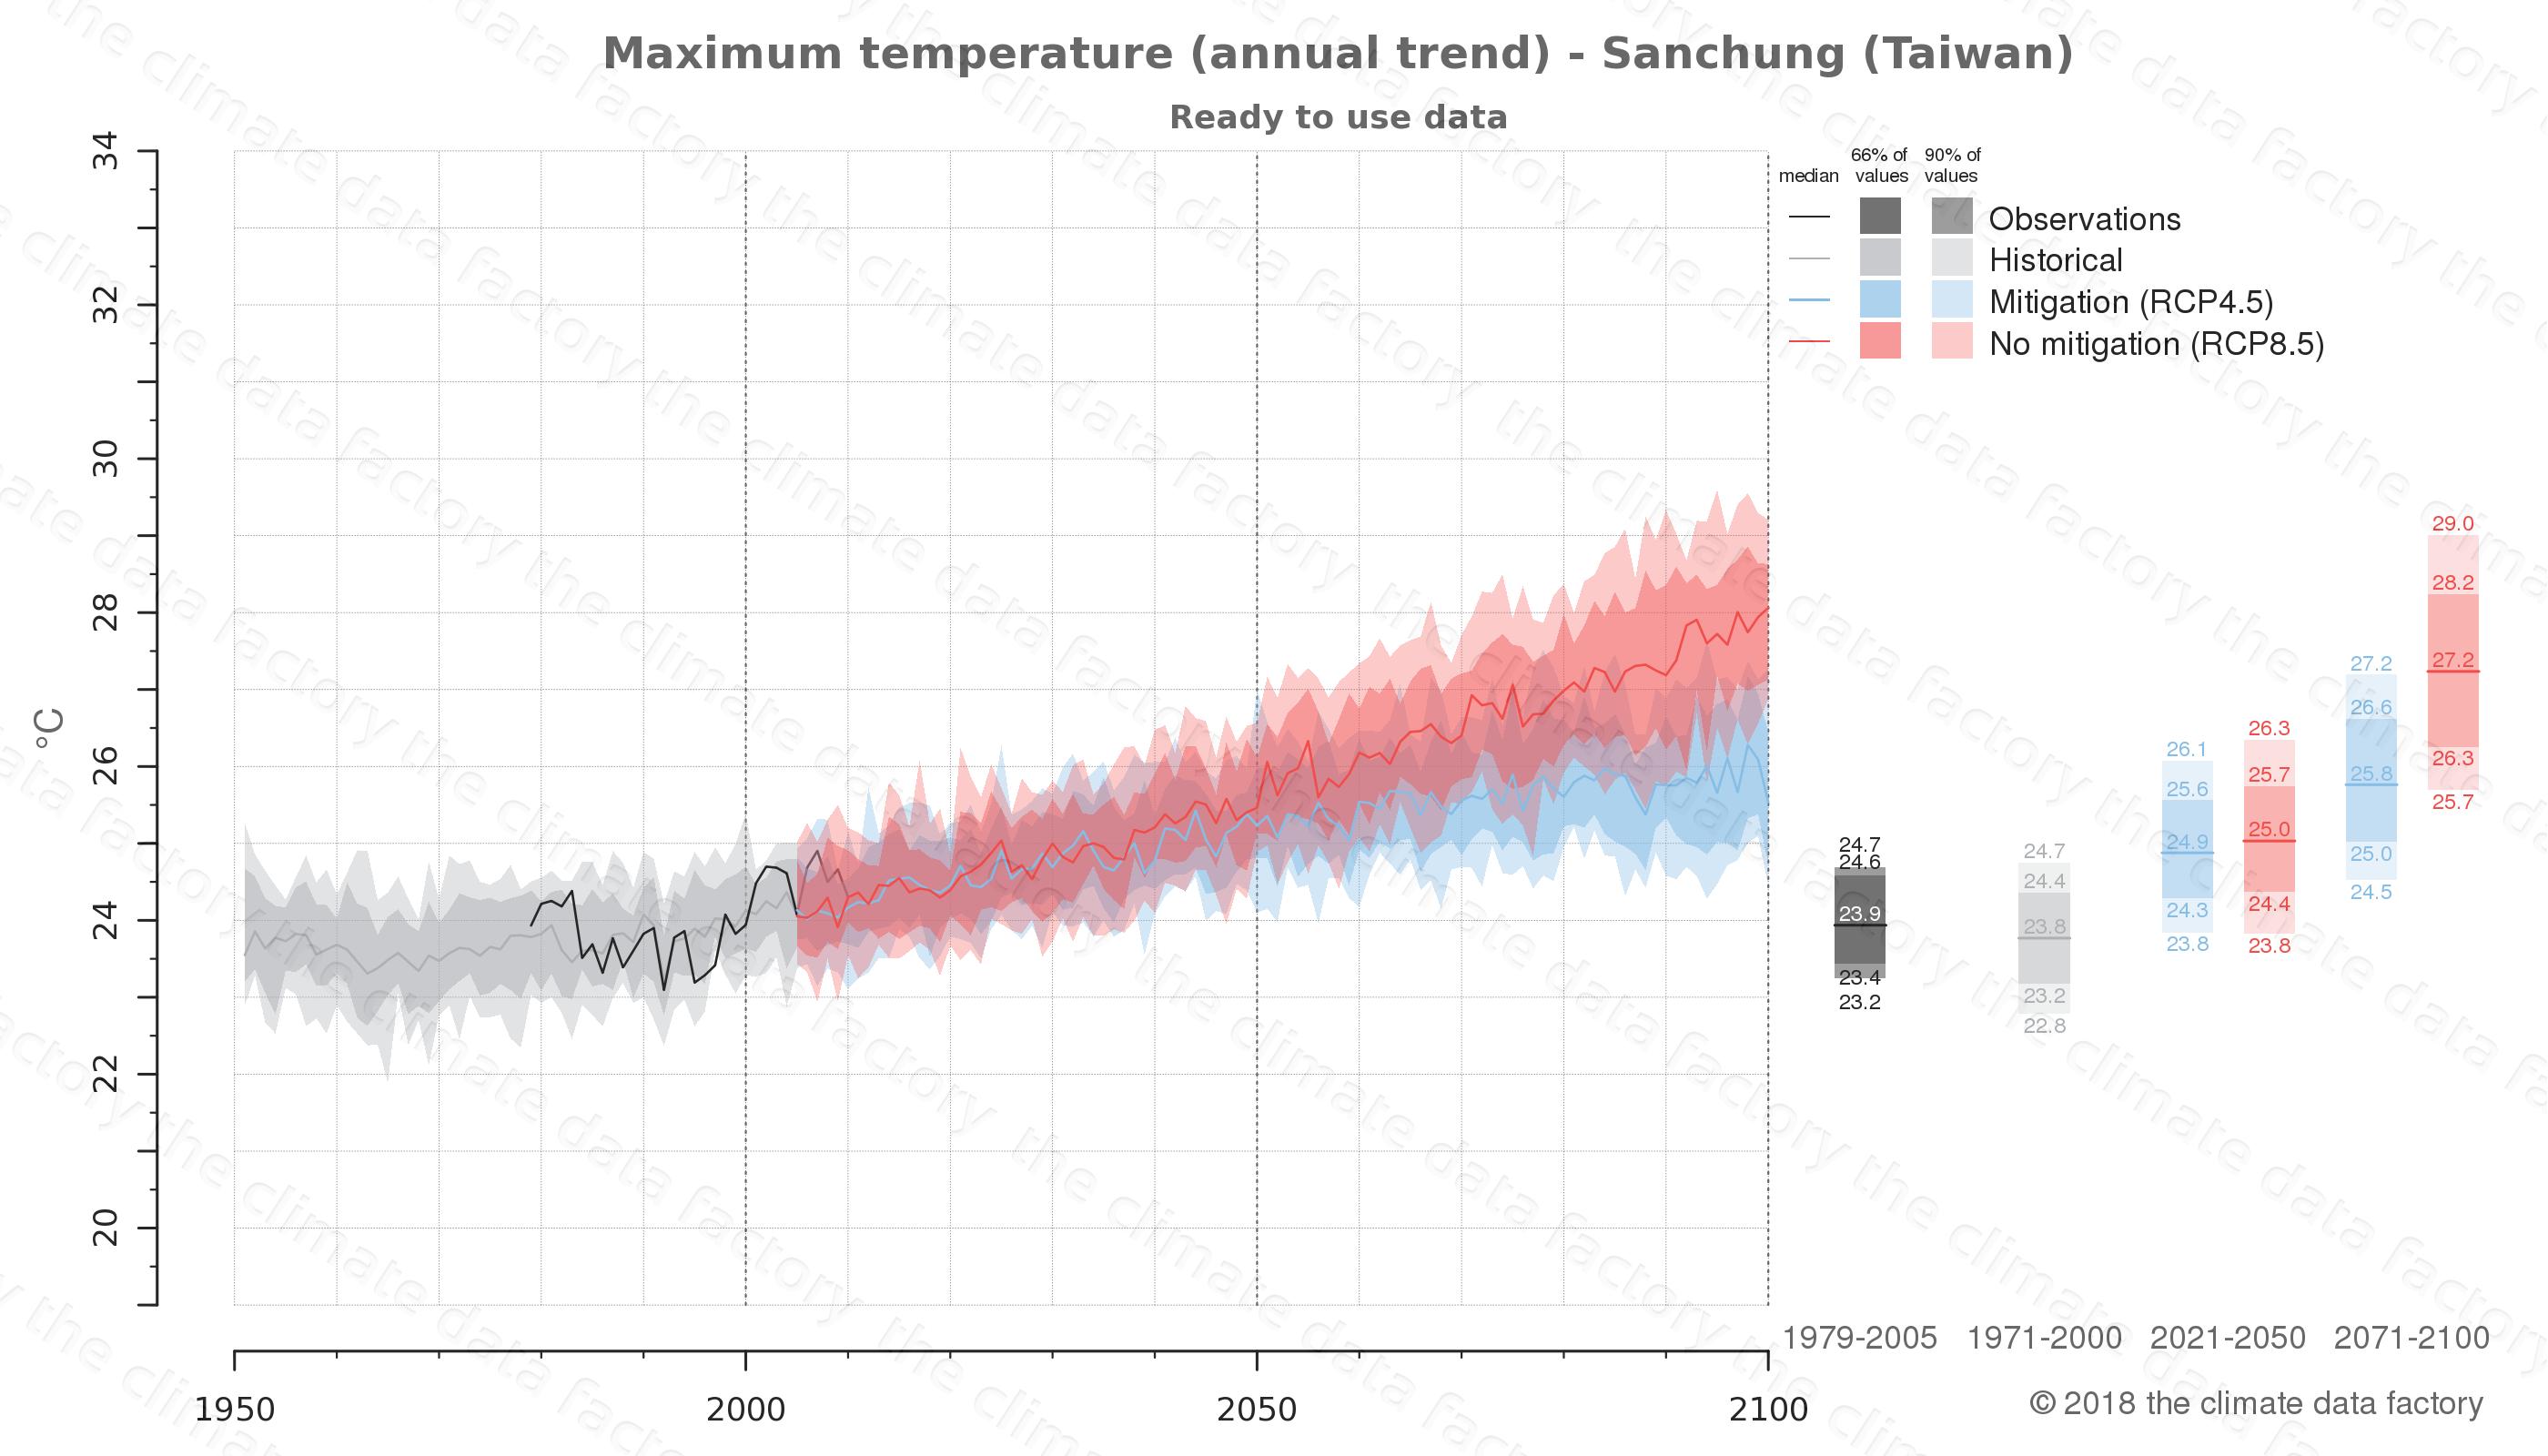 climate change data policy adaptation climate graph city data maximum-temperature sanchung taiwan